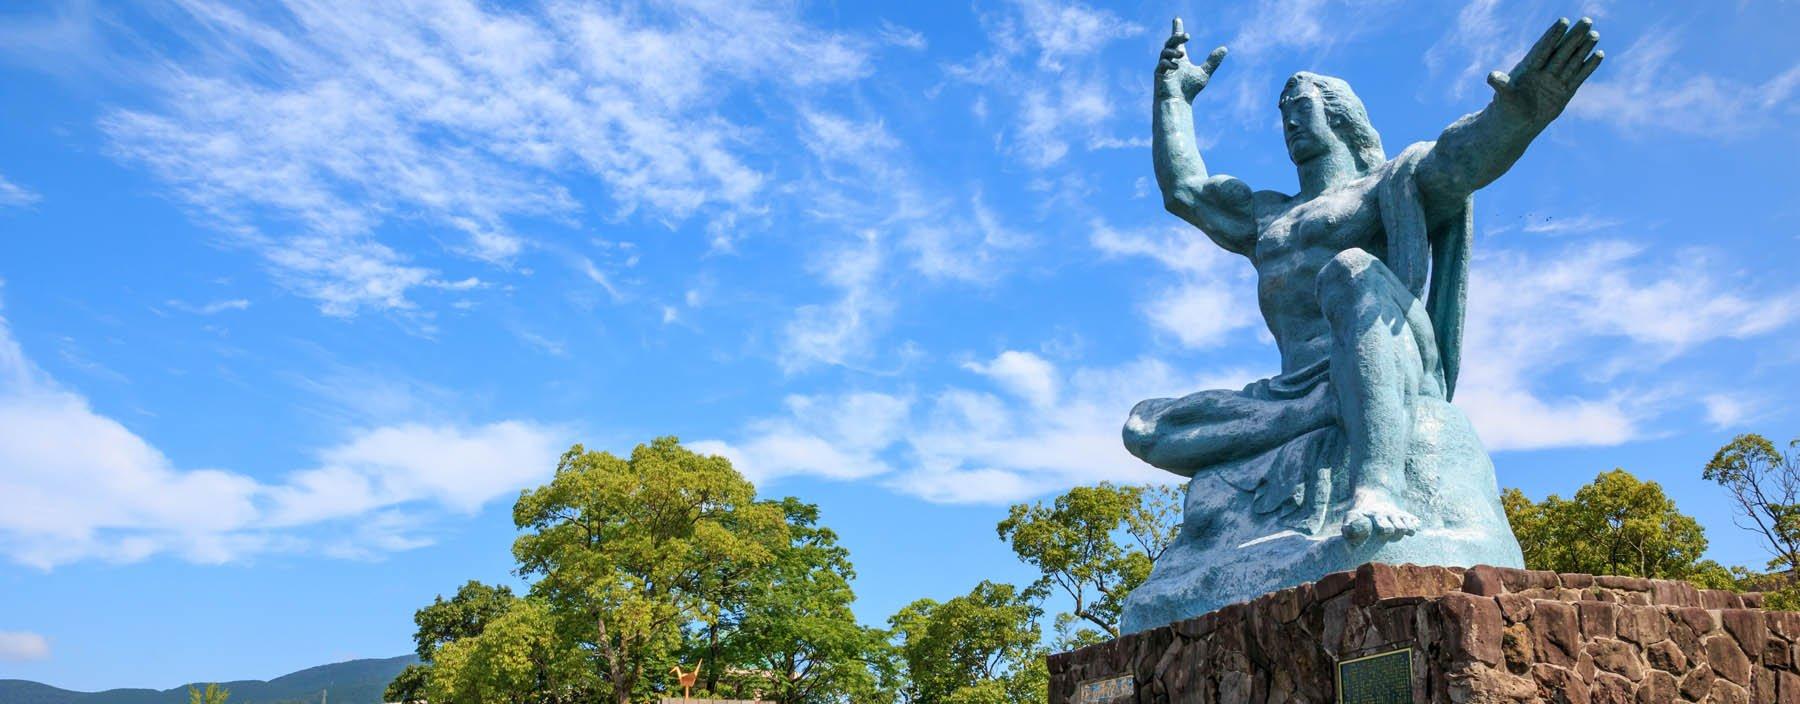 jp, nagasaki, vredesbeeld in het vredespark (1).jpg